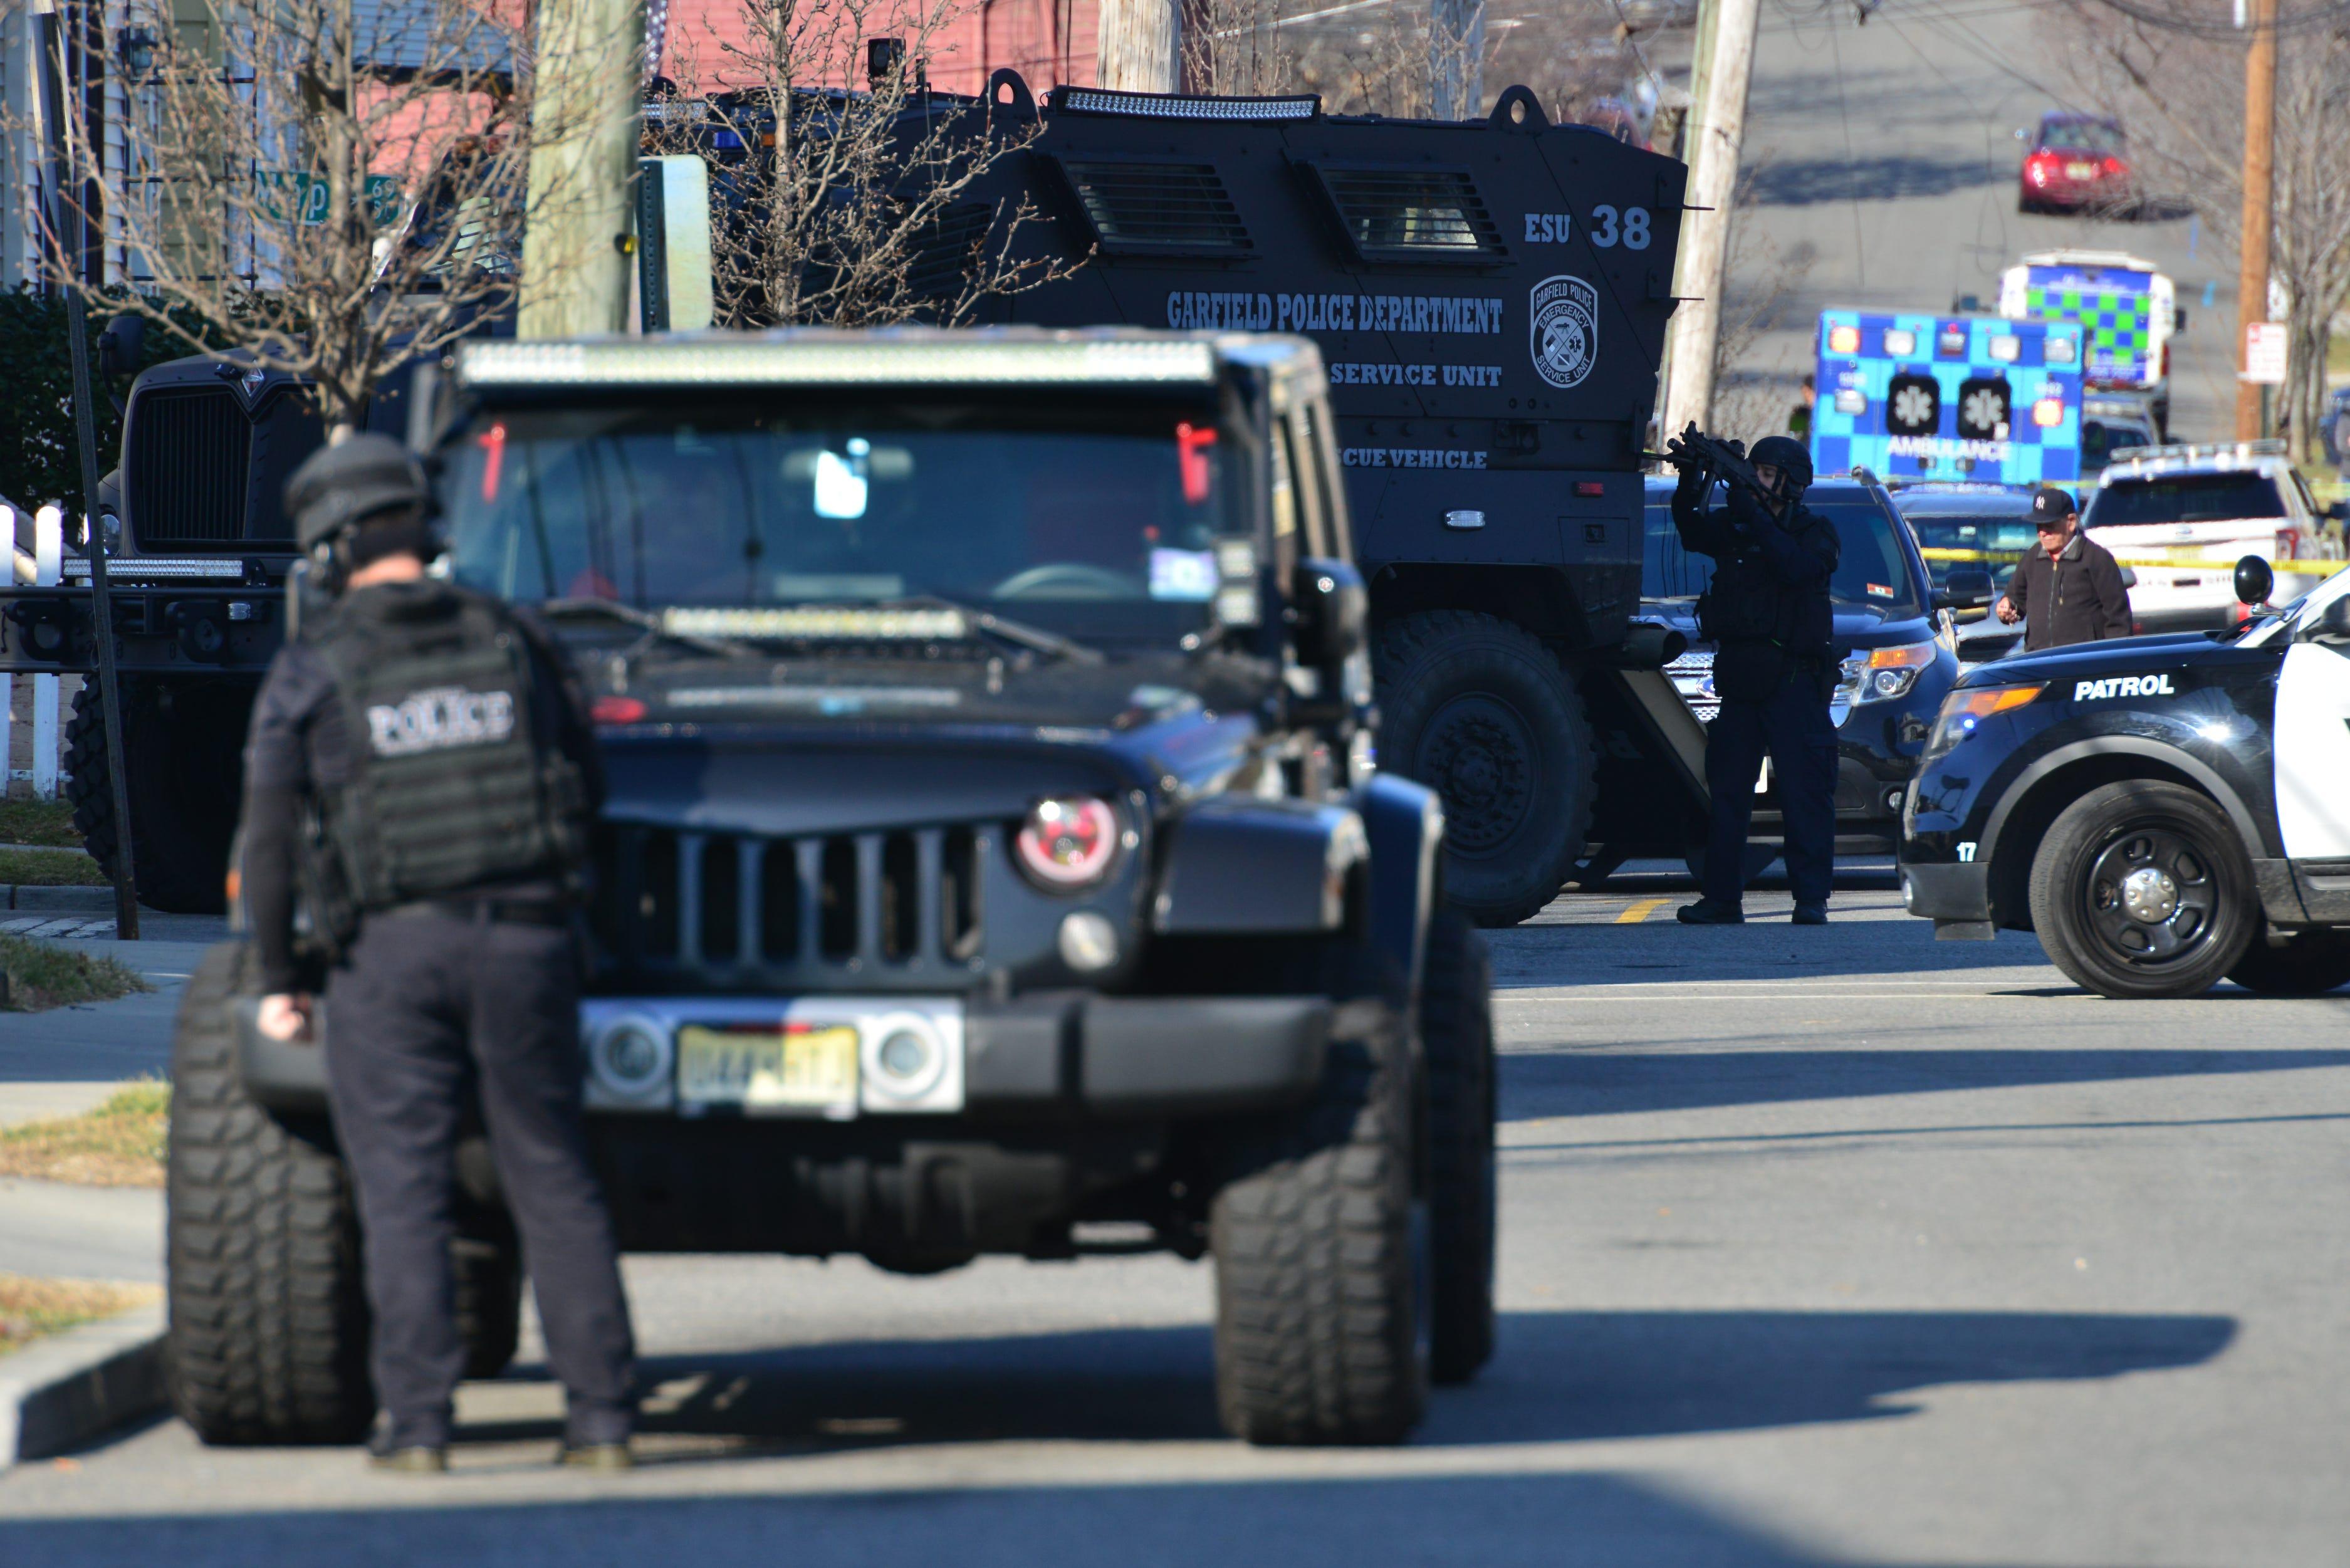 Swat Response Closes Garfield Nj Streets After Gunfire Report